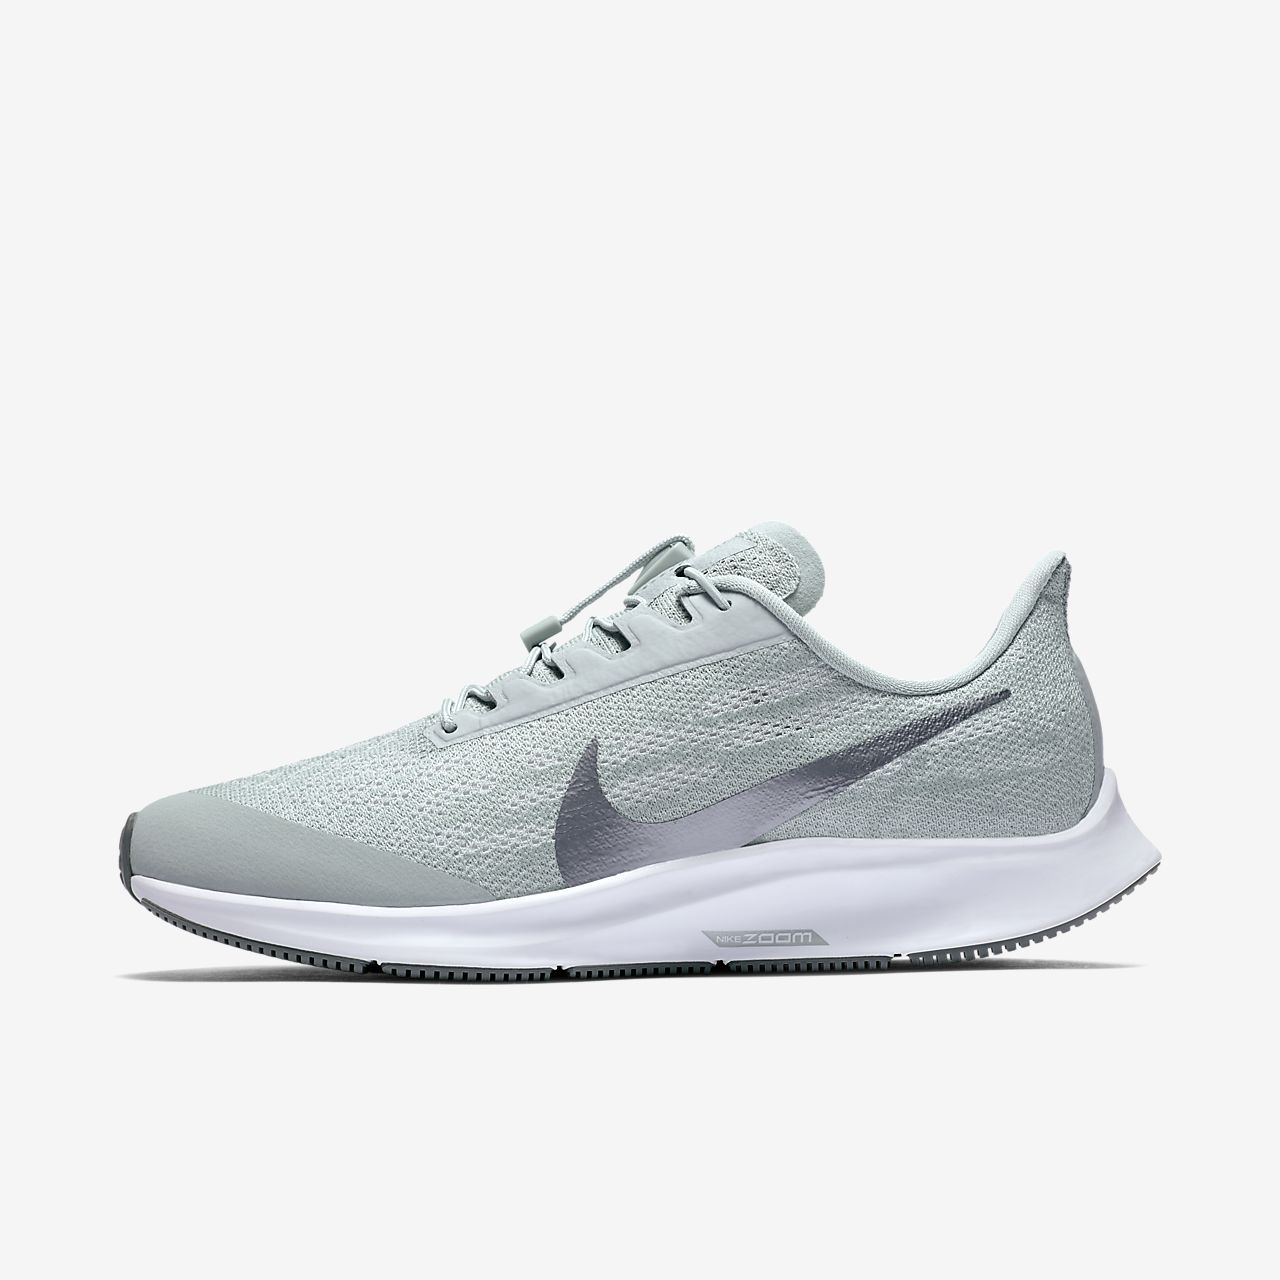 Scarpa da running Nike Air Zoom Pegasus 36 FlyEase - Donna